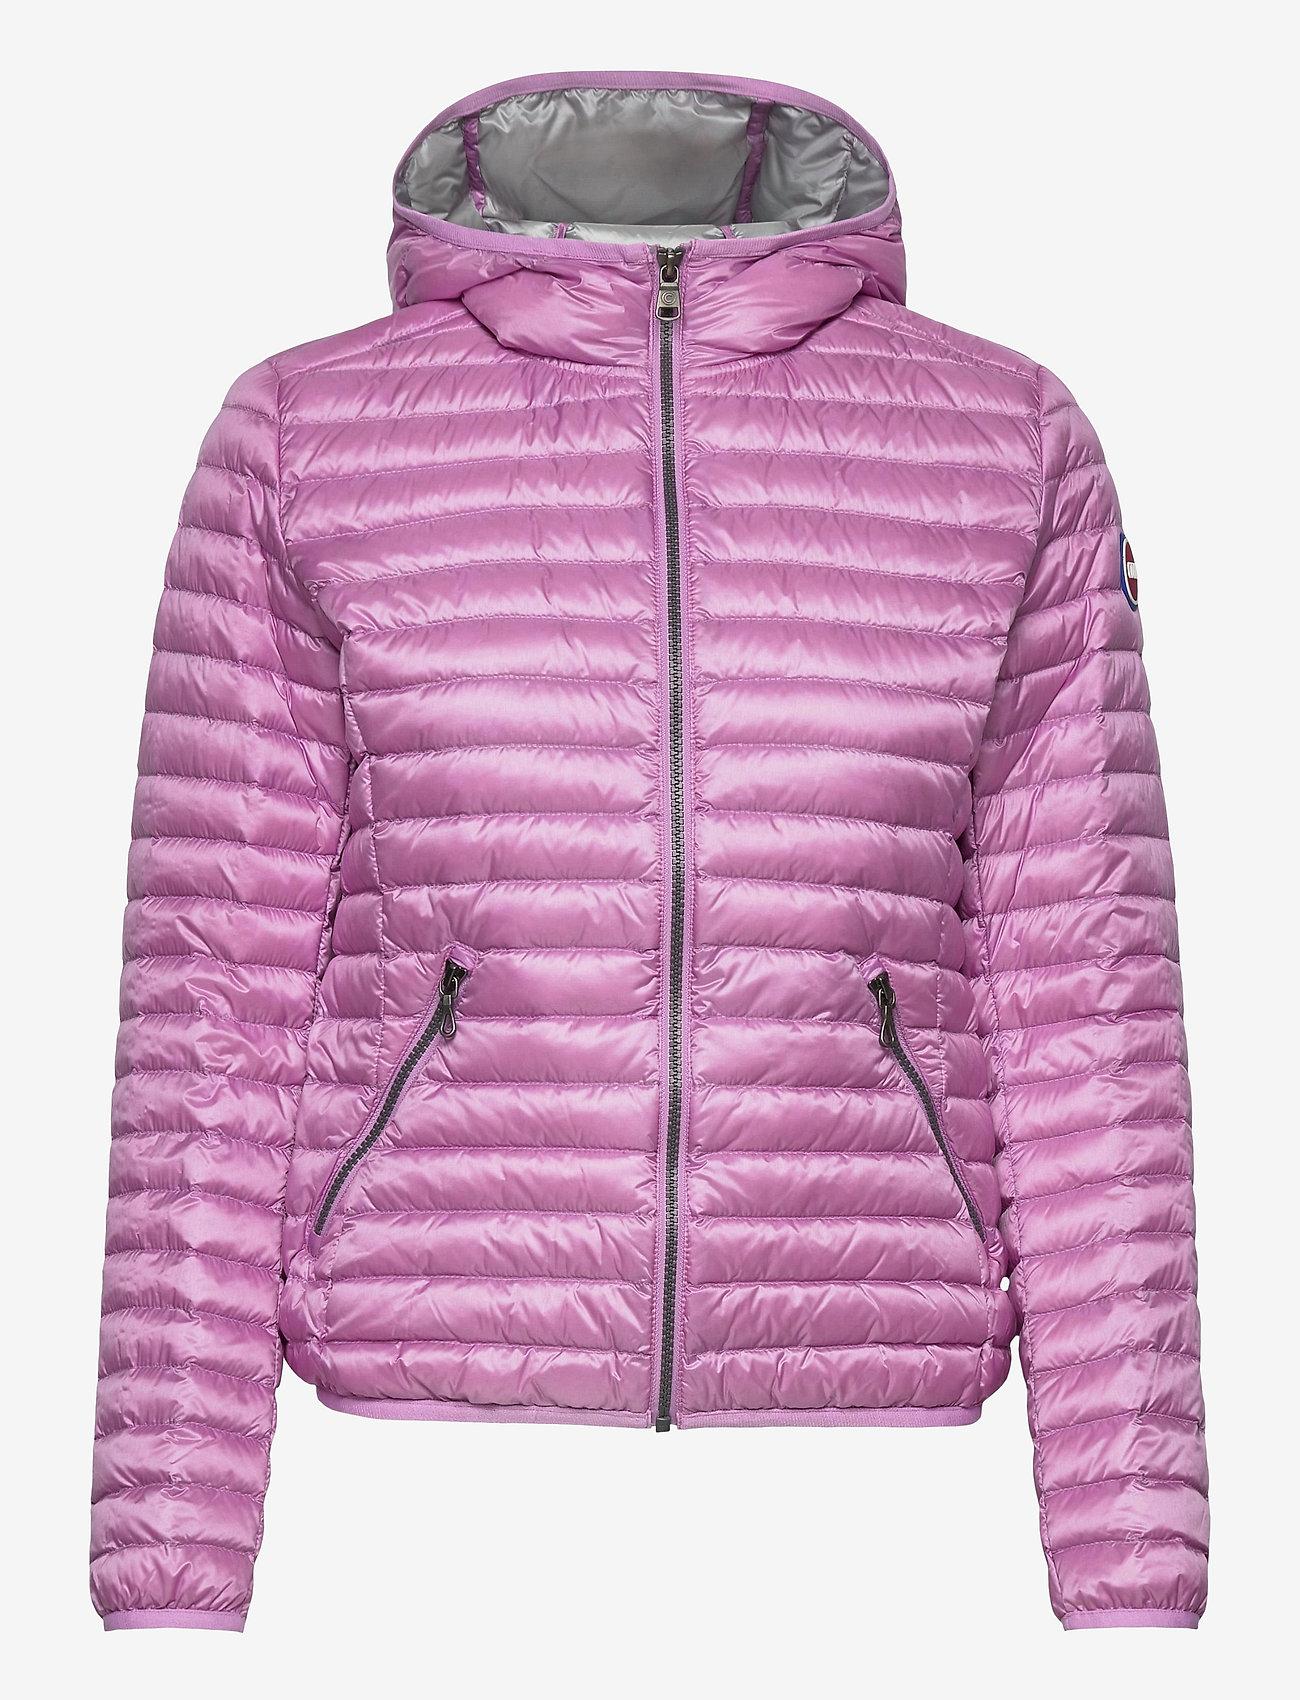 Colmar - LADIES DOWN JACKET - down- & padded jackets - etoile-light steel - 0